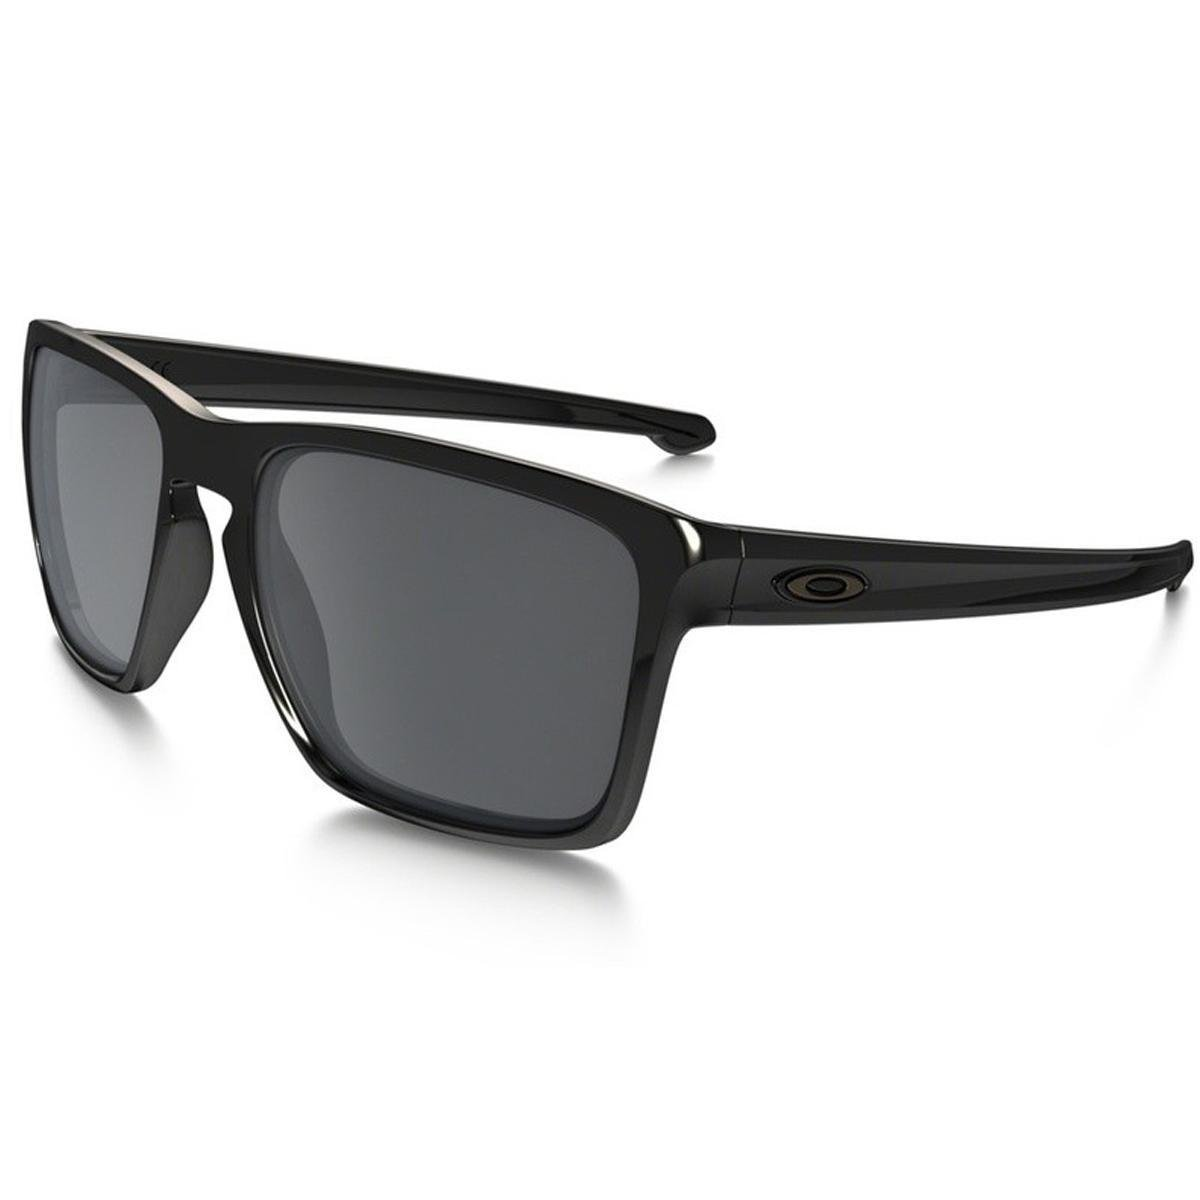 105d62dbbcf96 Óculos de Sol Oakley Sliver XL OO9341 - Matte Grey Ink - Prizm Sapphire  Polarized ...